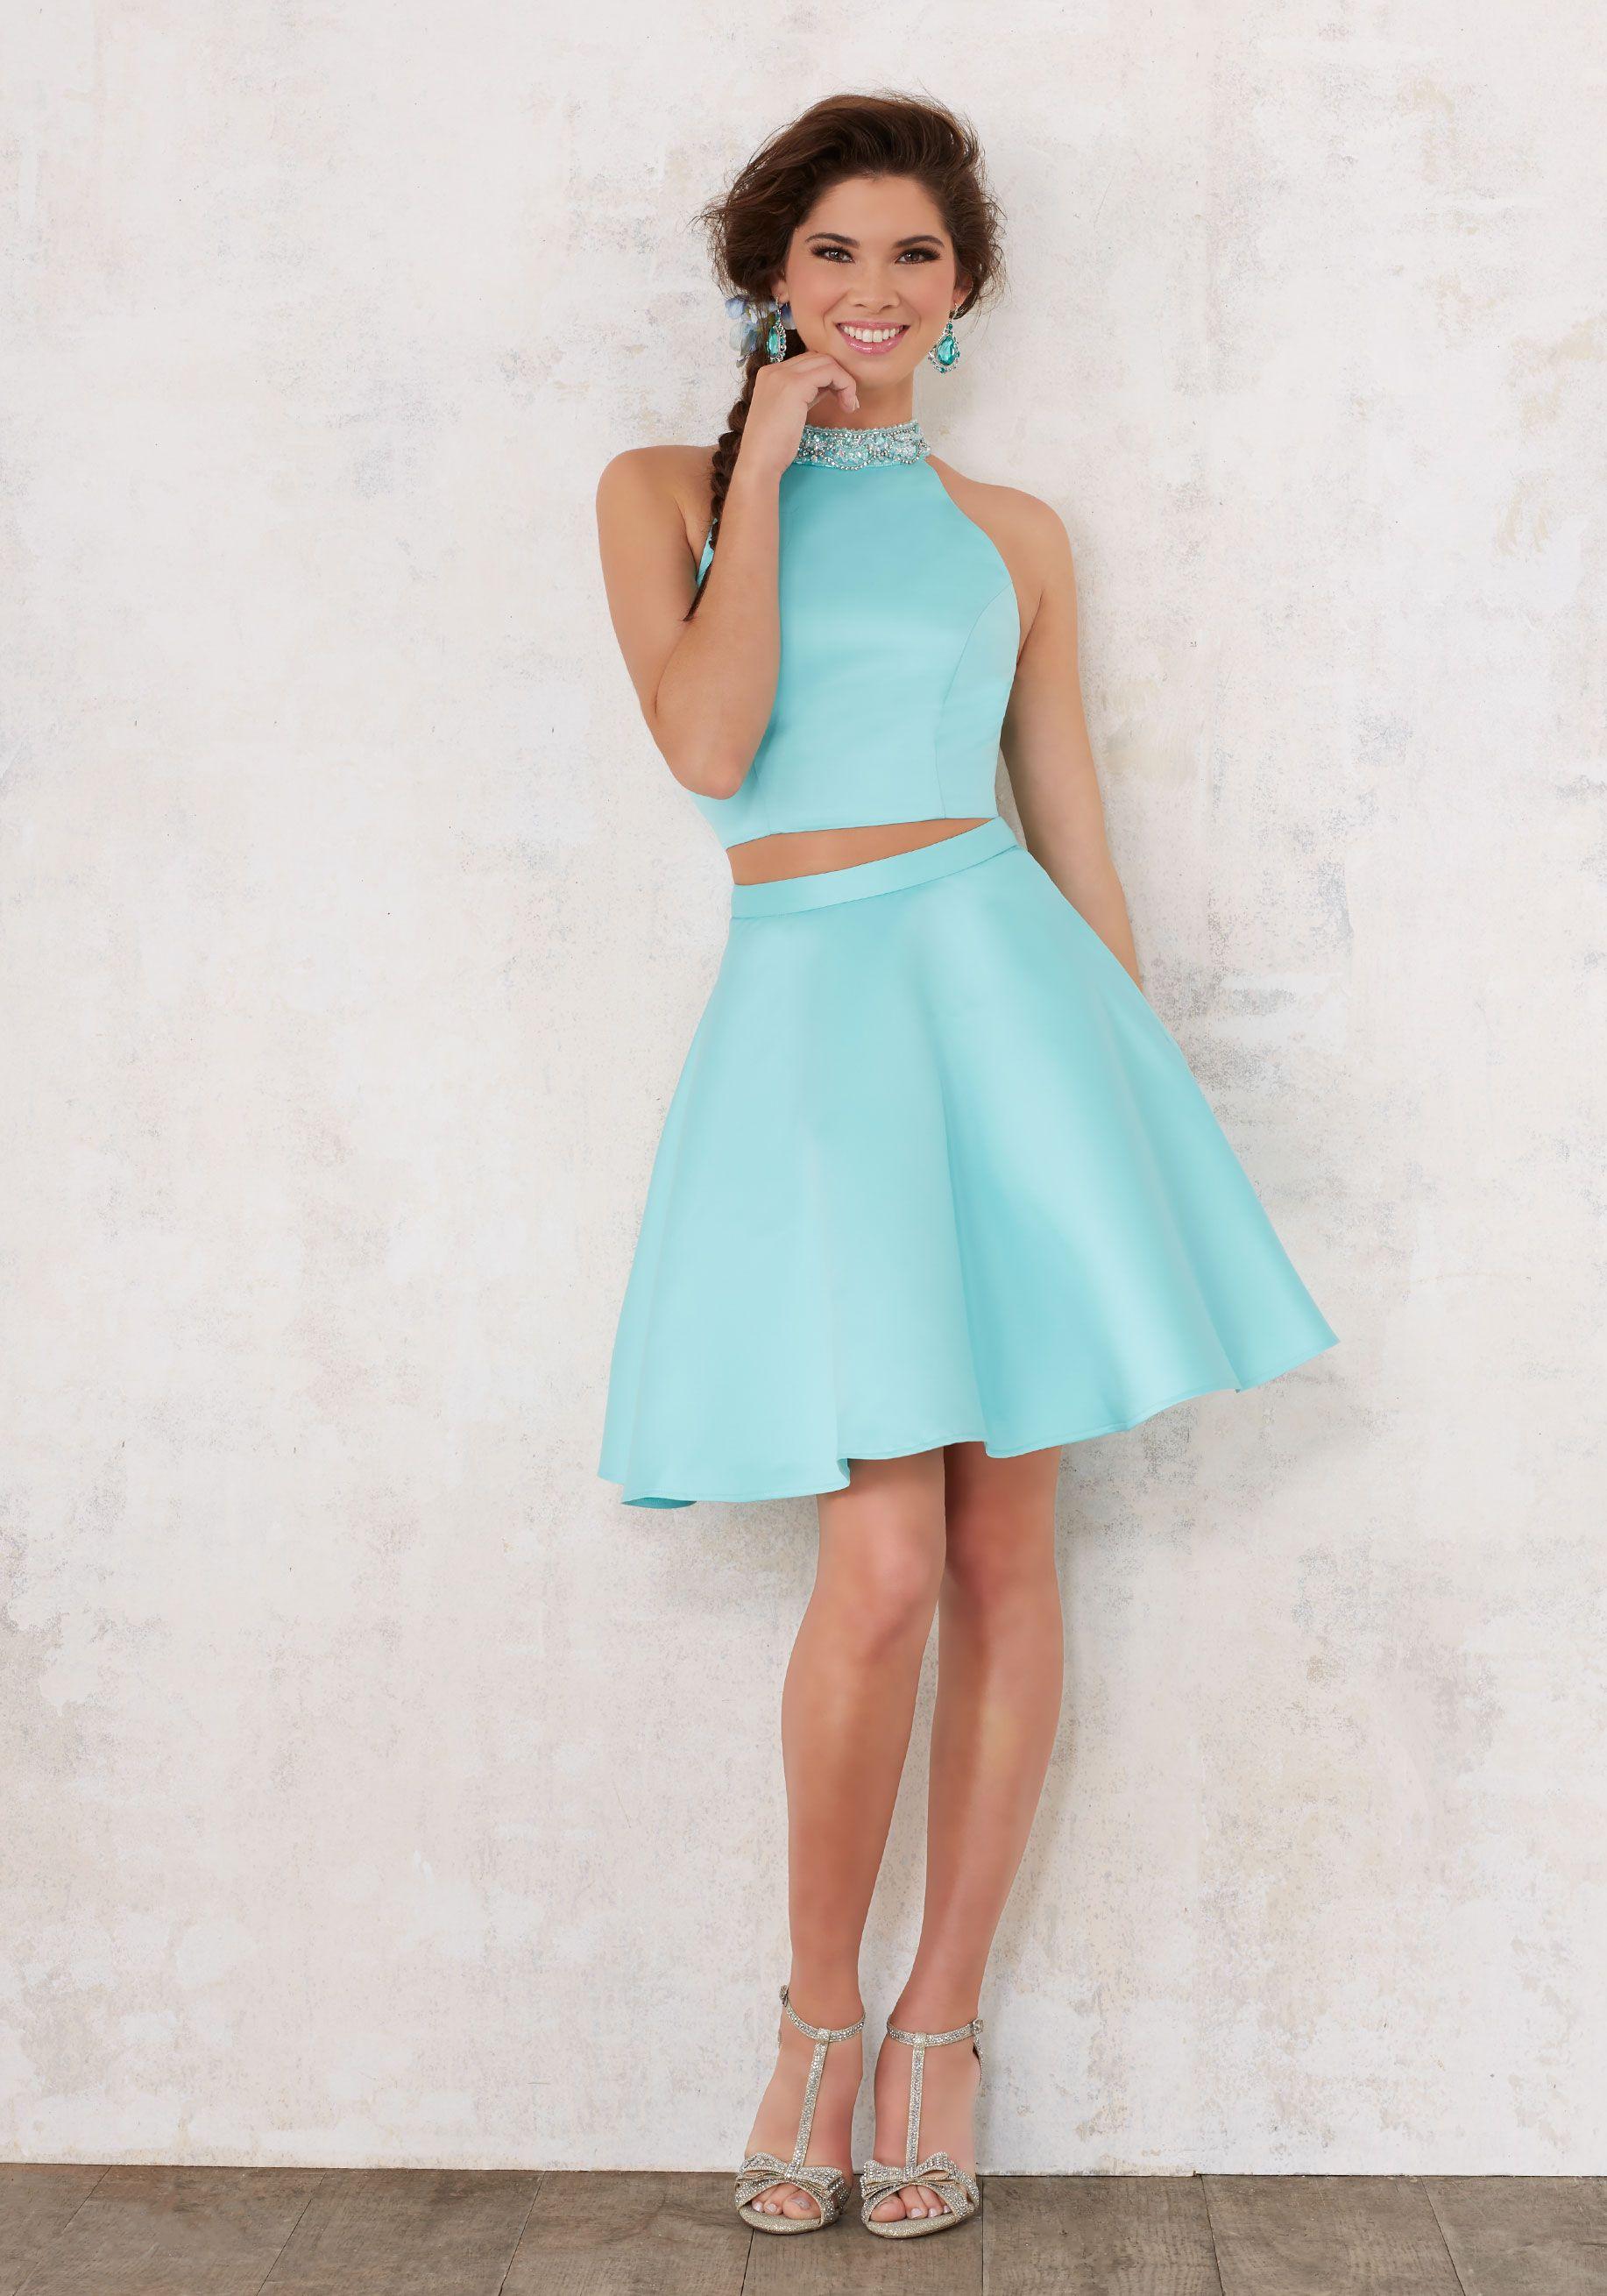 Flirty Two Piece Satin Damas Dress With Beaded High Neckline Open Keyhole Back Colors Available Aqua Coral B Dama Dresses Sweet Sixteen Dresses Piece Dress [ 2620 x 1834 Pixel ]